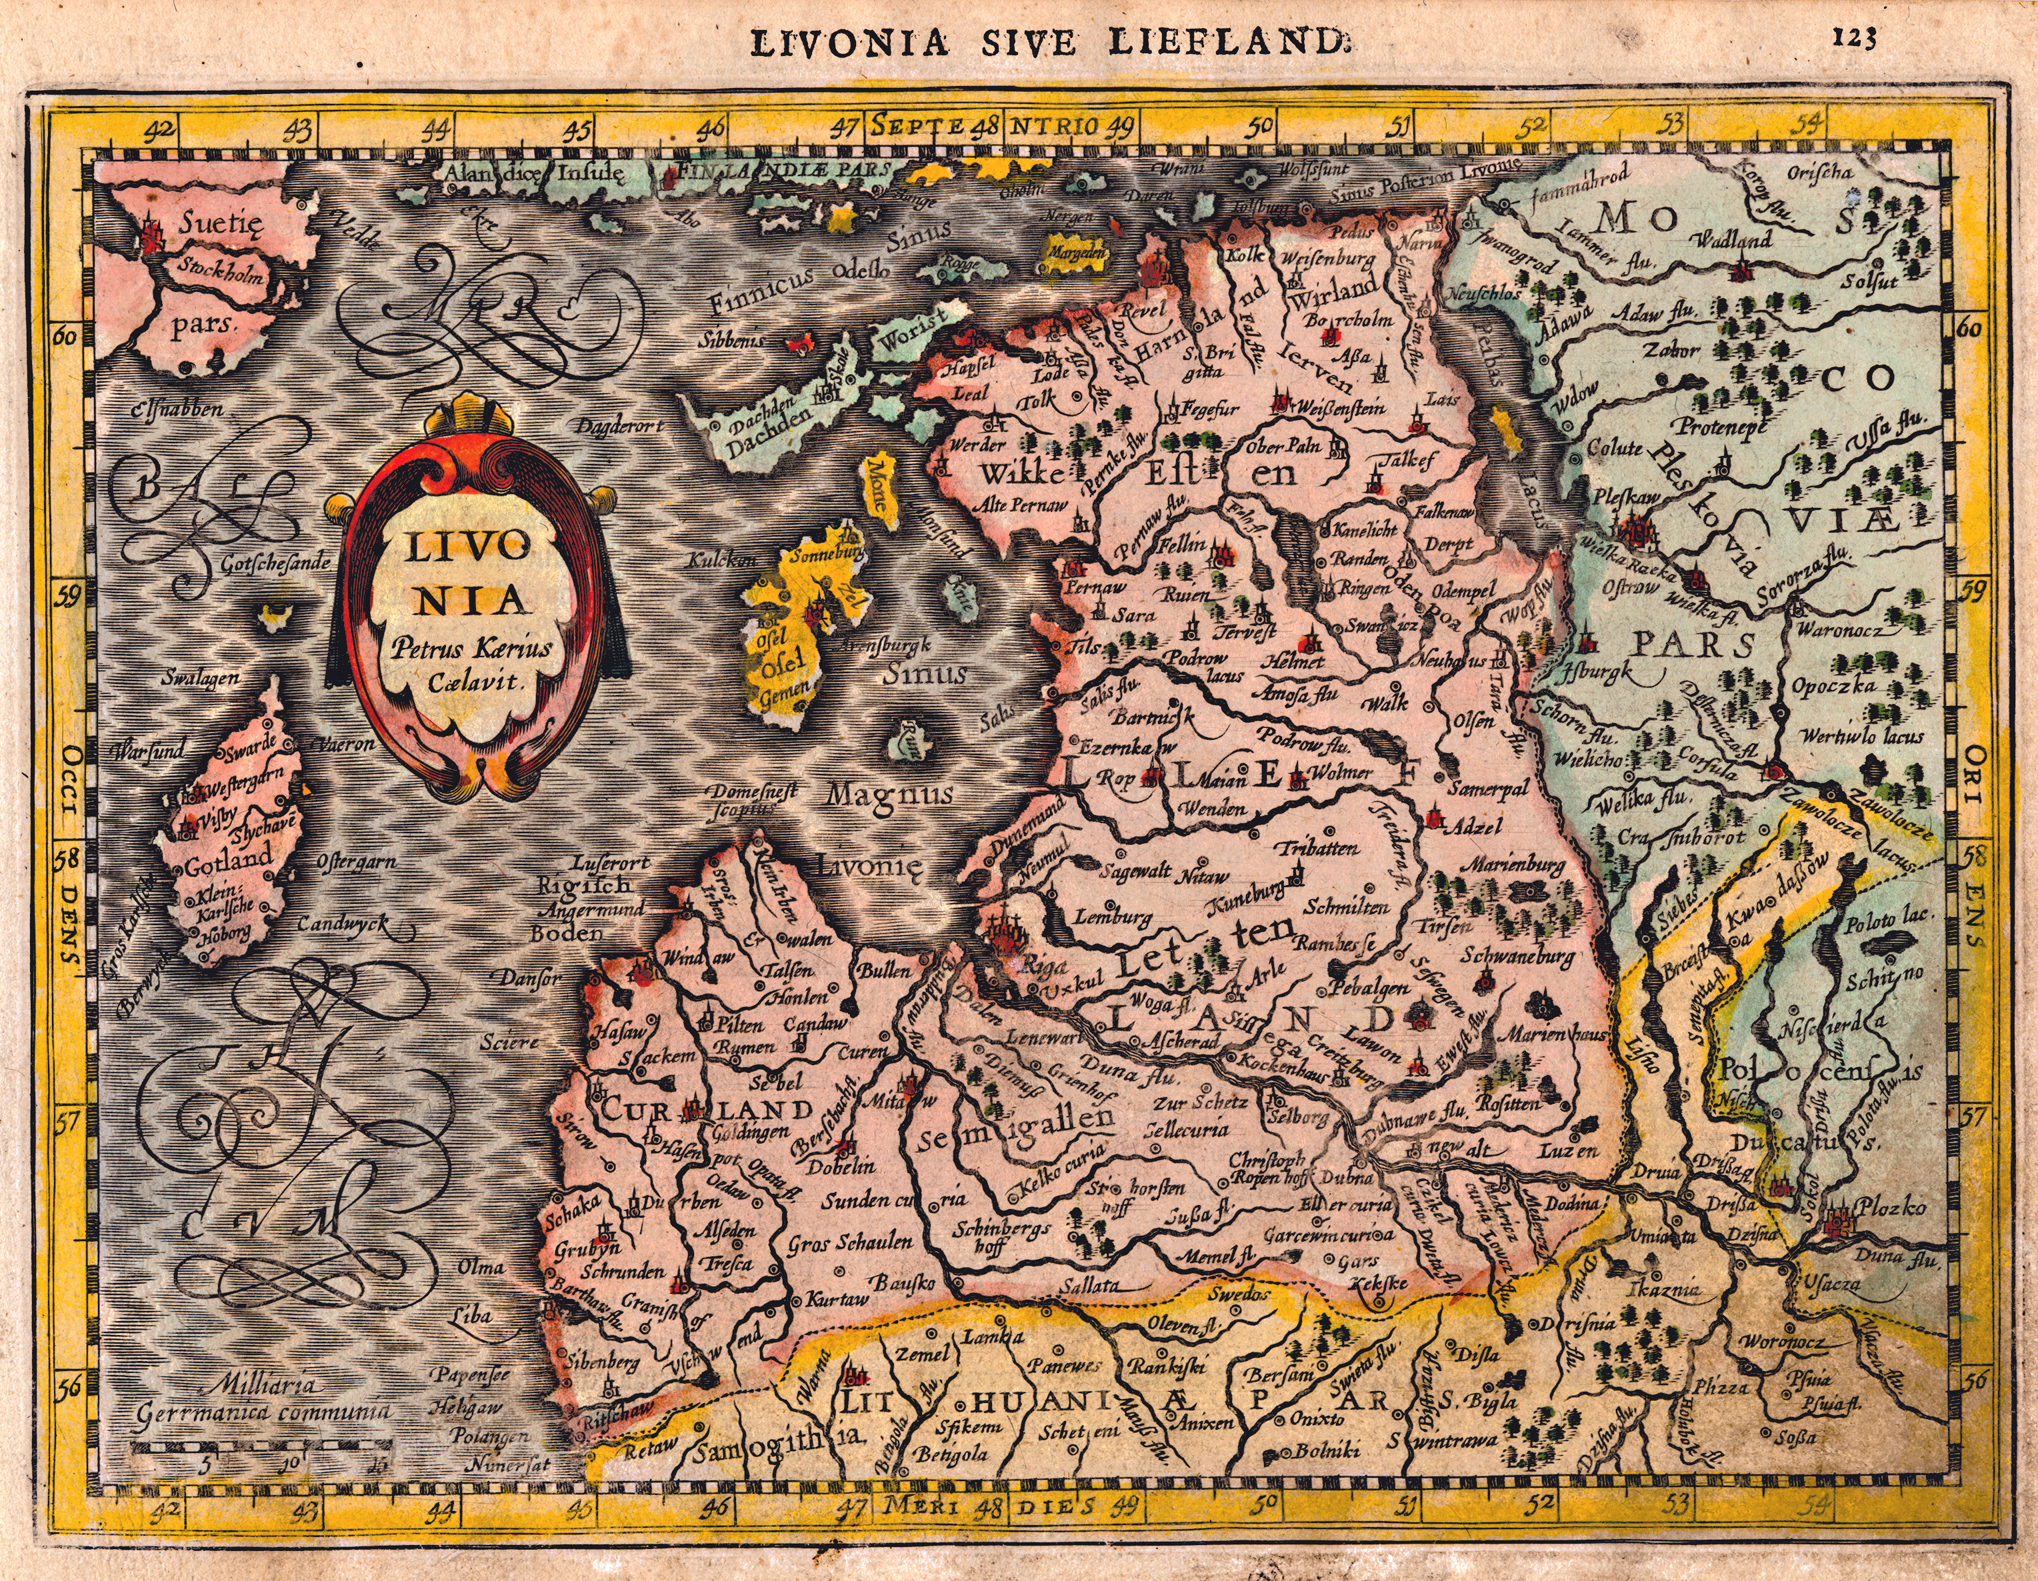 Livonia dating